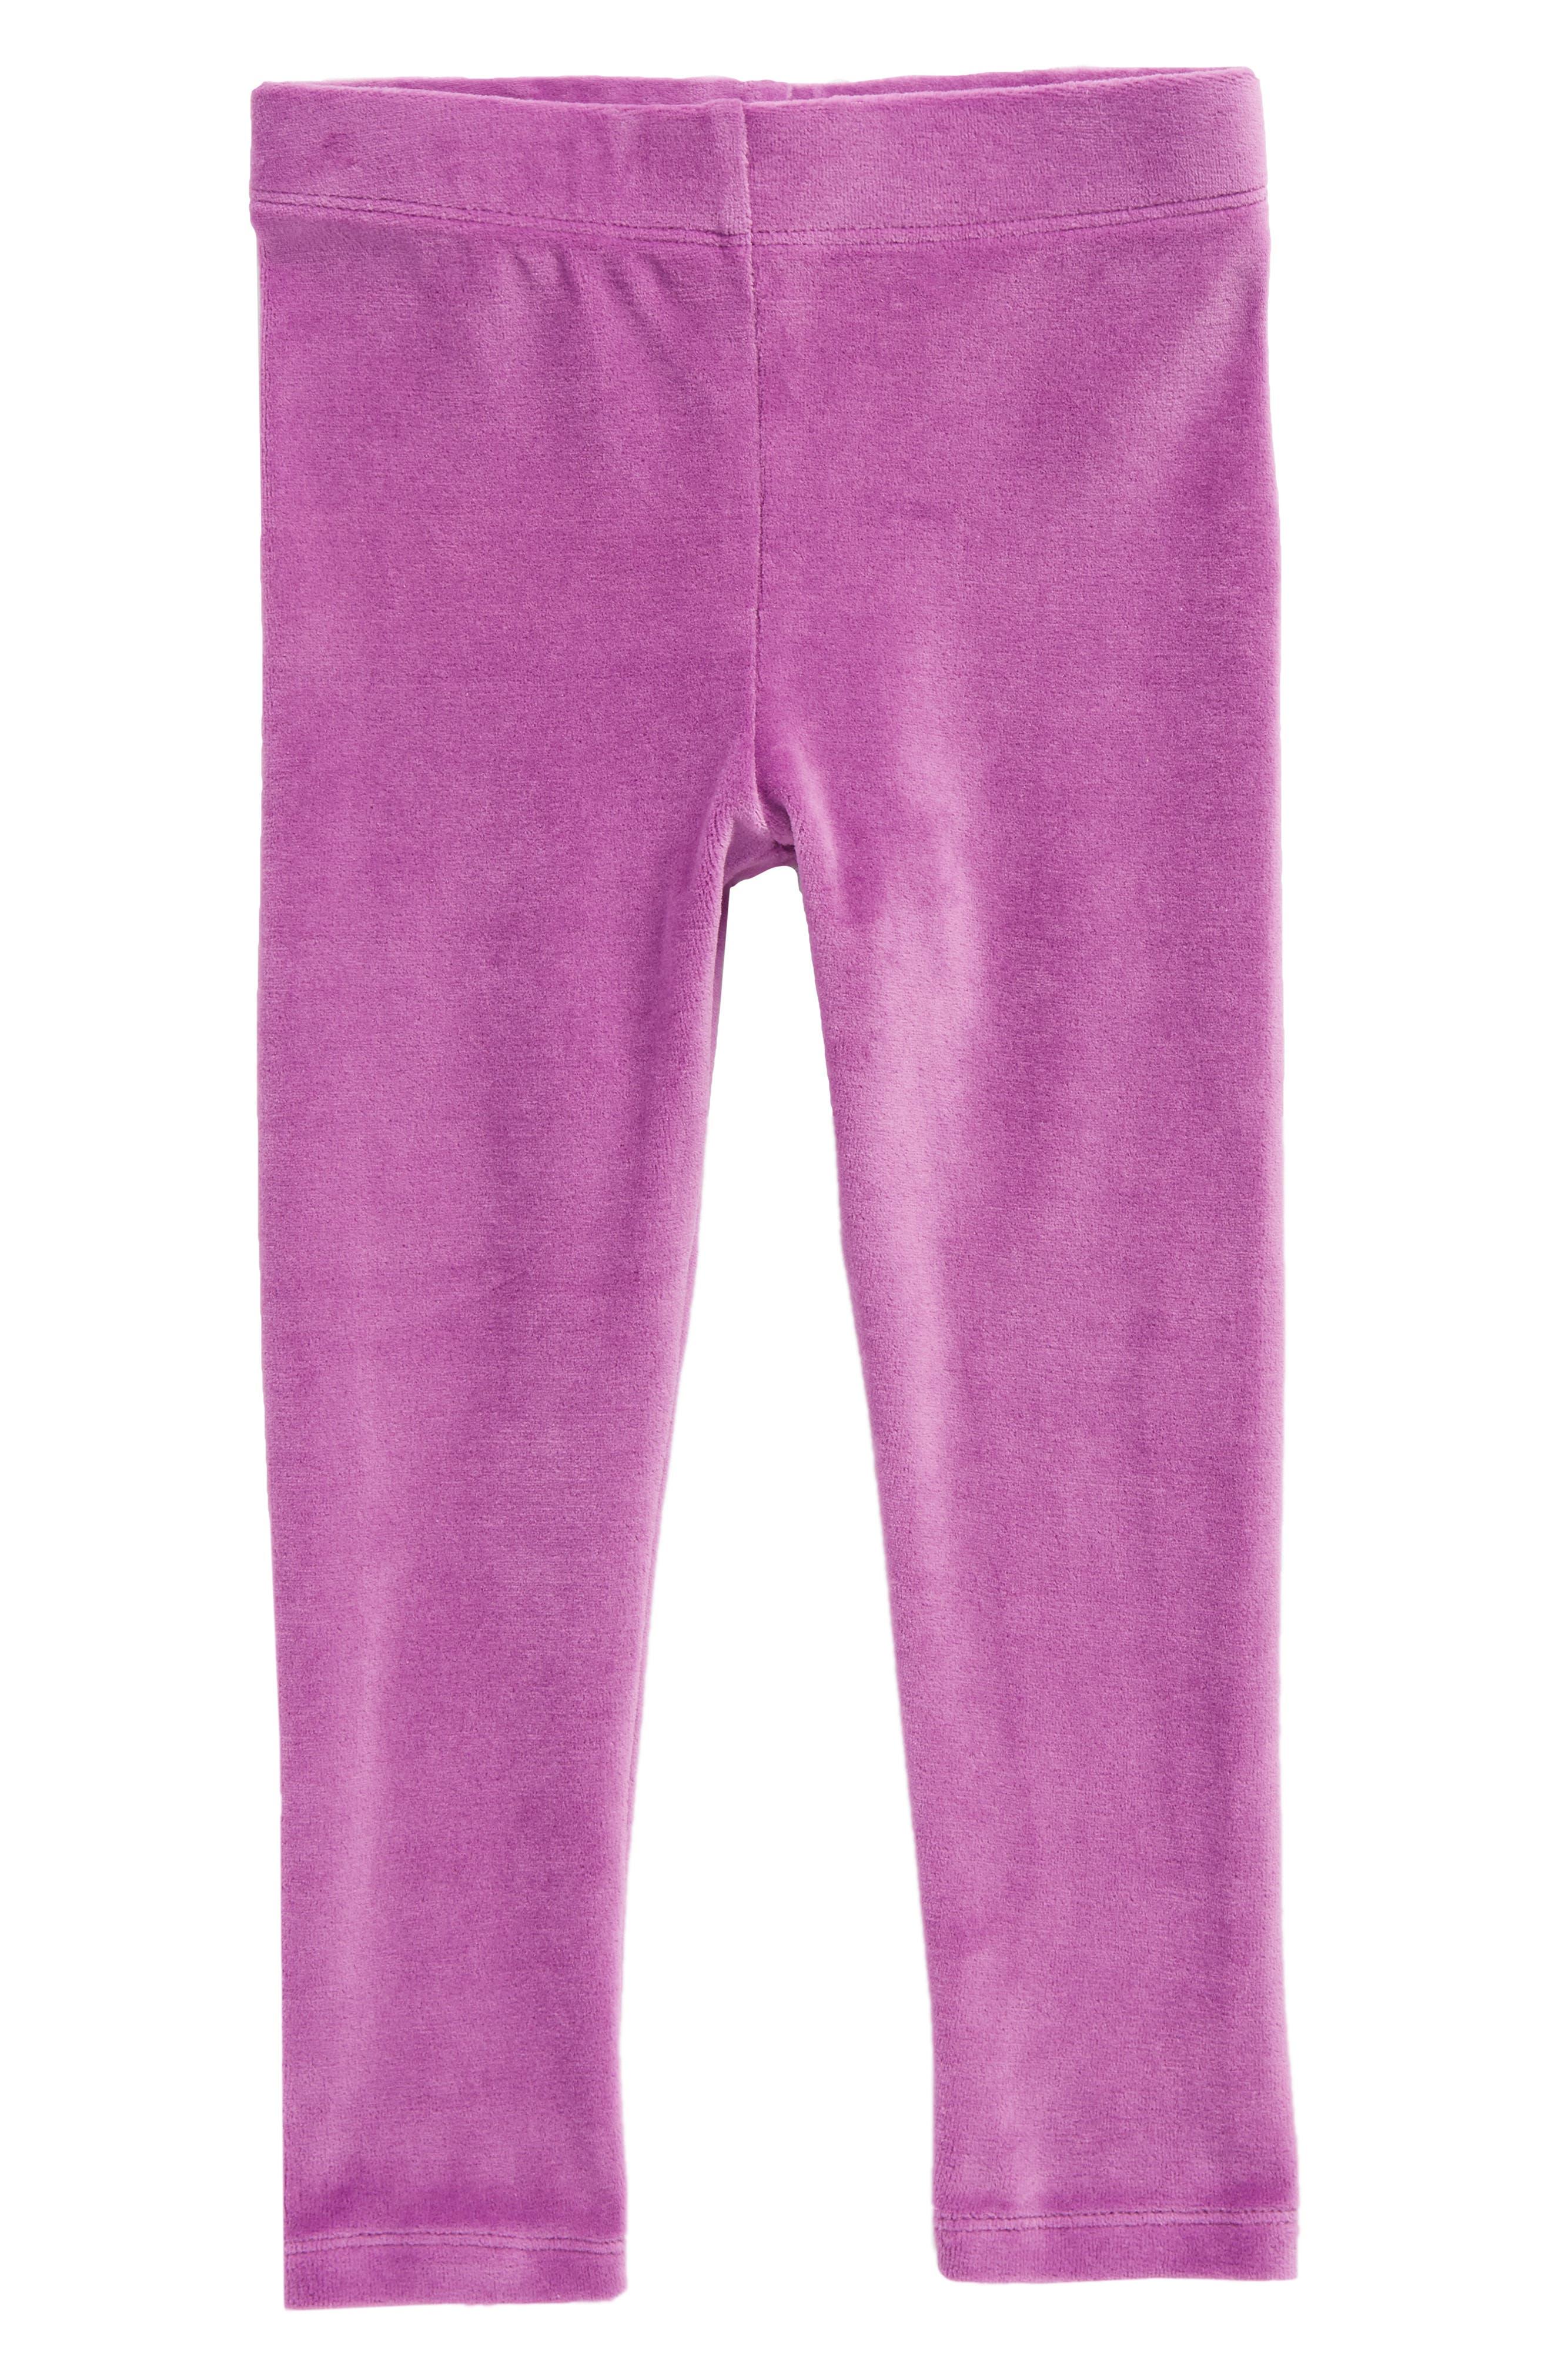 Velvet Leggings,                             Main thumbnail 1, color,                             Blackcurrant Purple